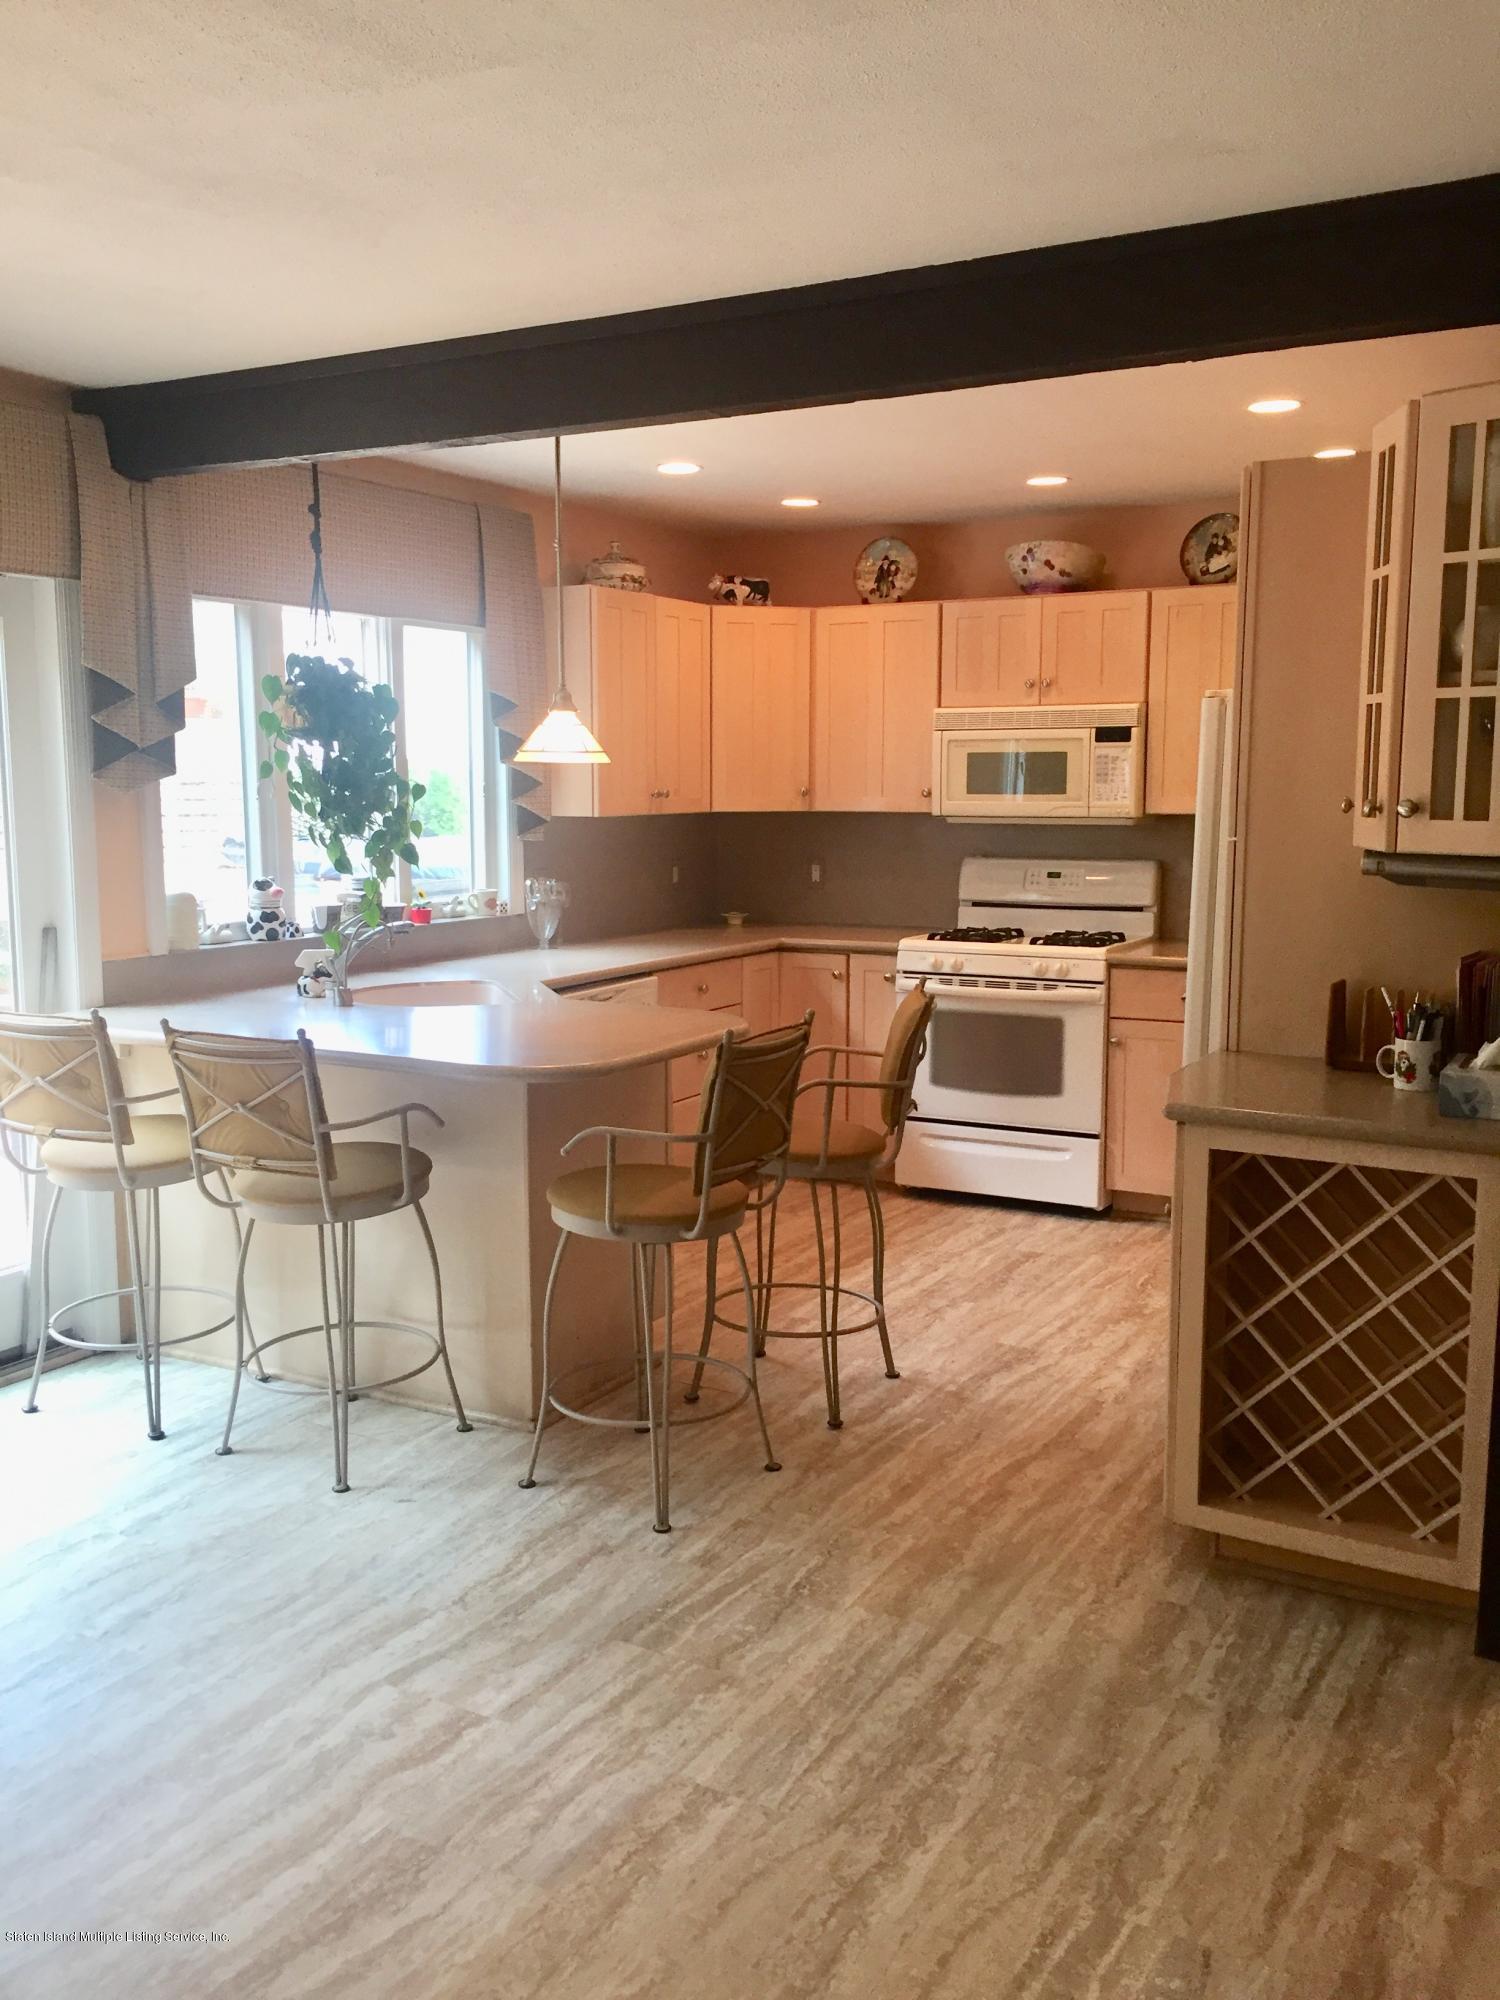 Single Family - Detached 46 Forrestal Avenue  Staten Island, NY 10312, MLS-1131922-15